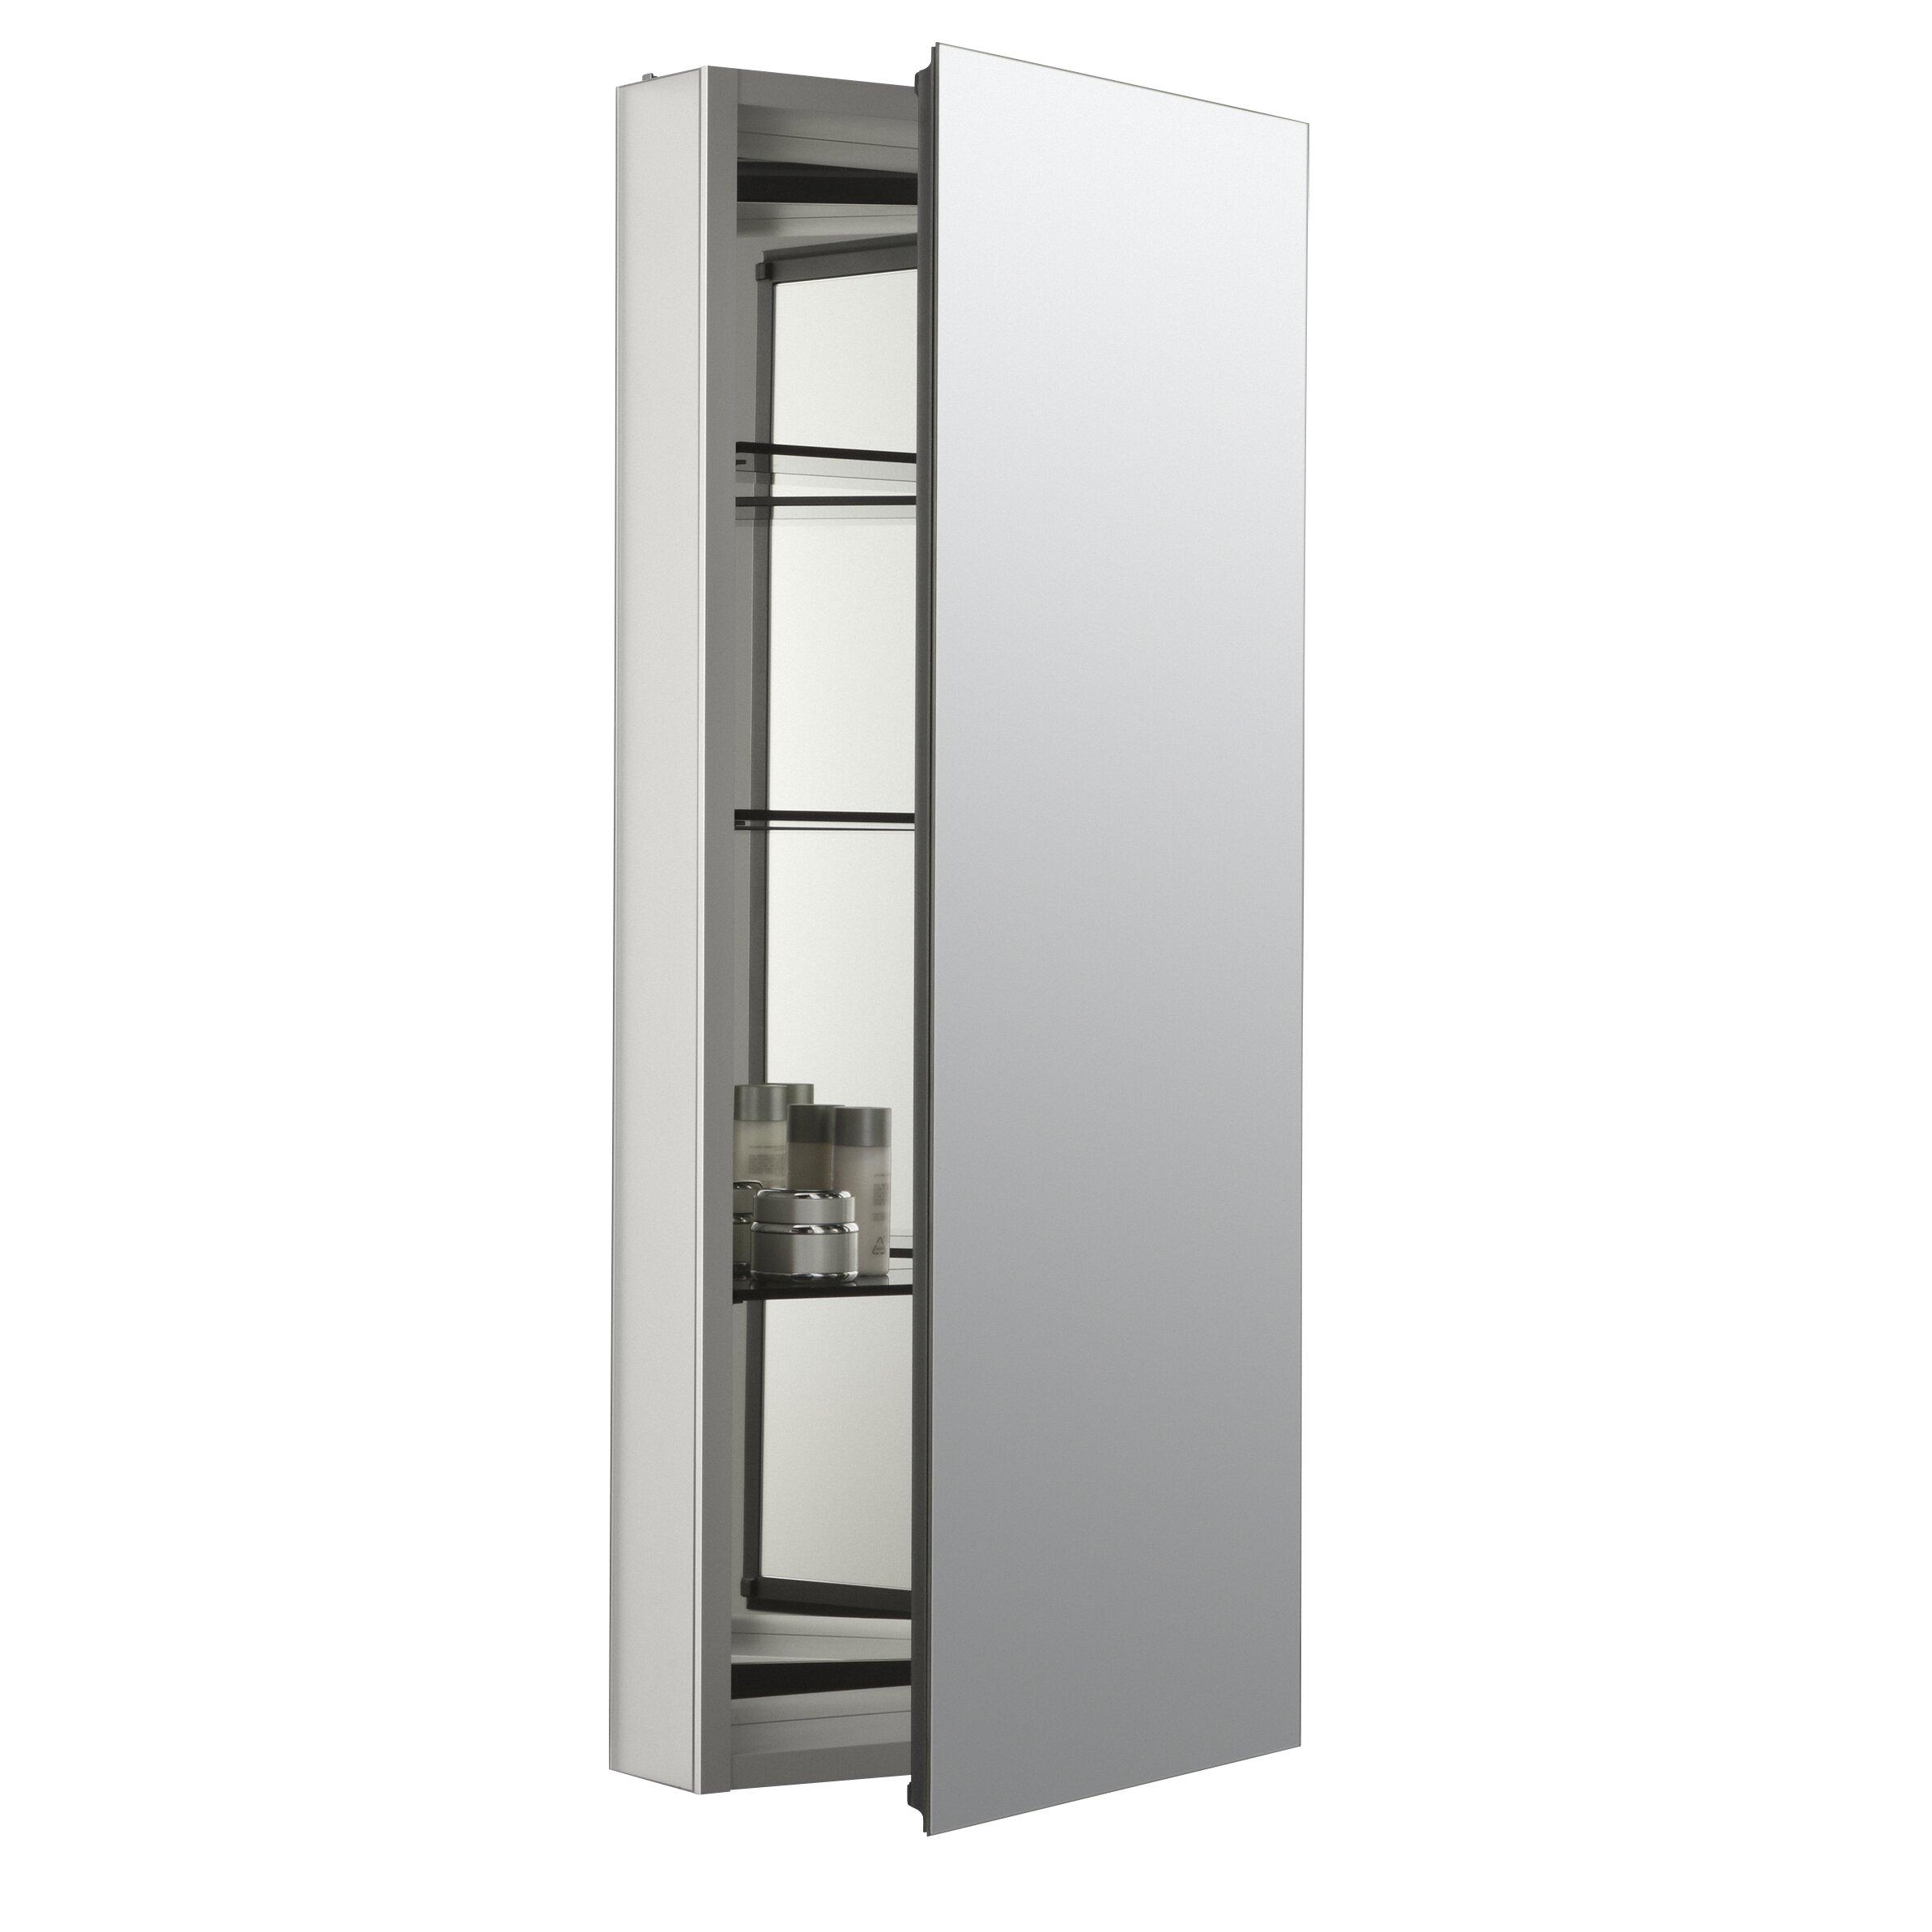 18 X 24 Medicine Cabinet Kohler Catalan 15 W X 36 H Aluminum Single Door Medicine Cabinet